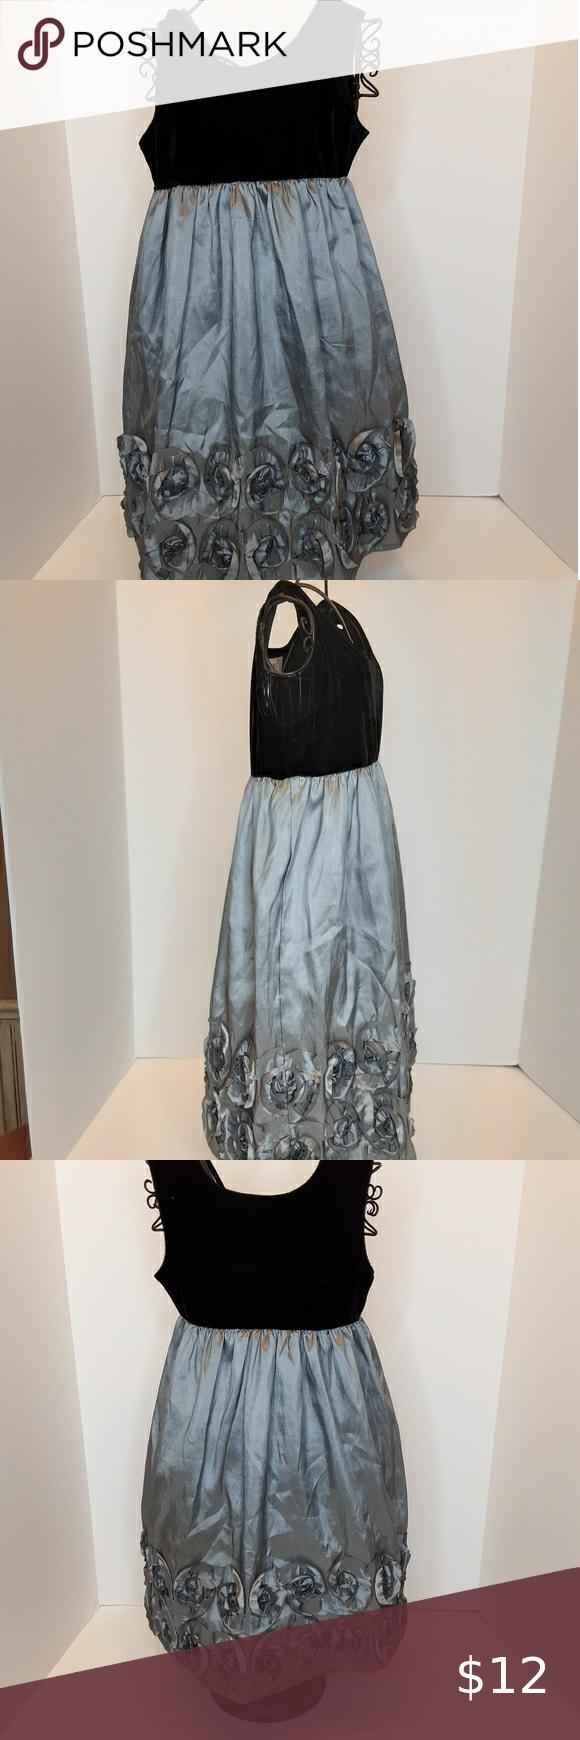 22nd Street Black Silver Taffeta Dress Size 4t Dresses Youth Jumpsuits For Girls Gap Sweater Dress [ 1740 x 580 Pixel ]